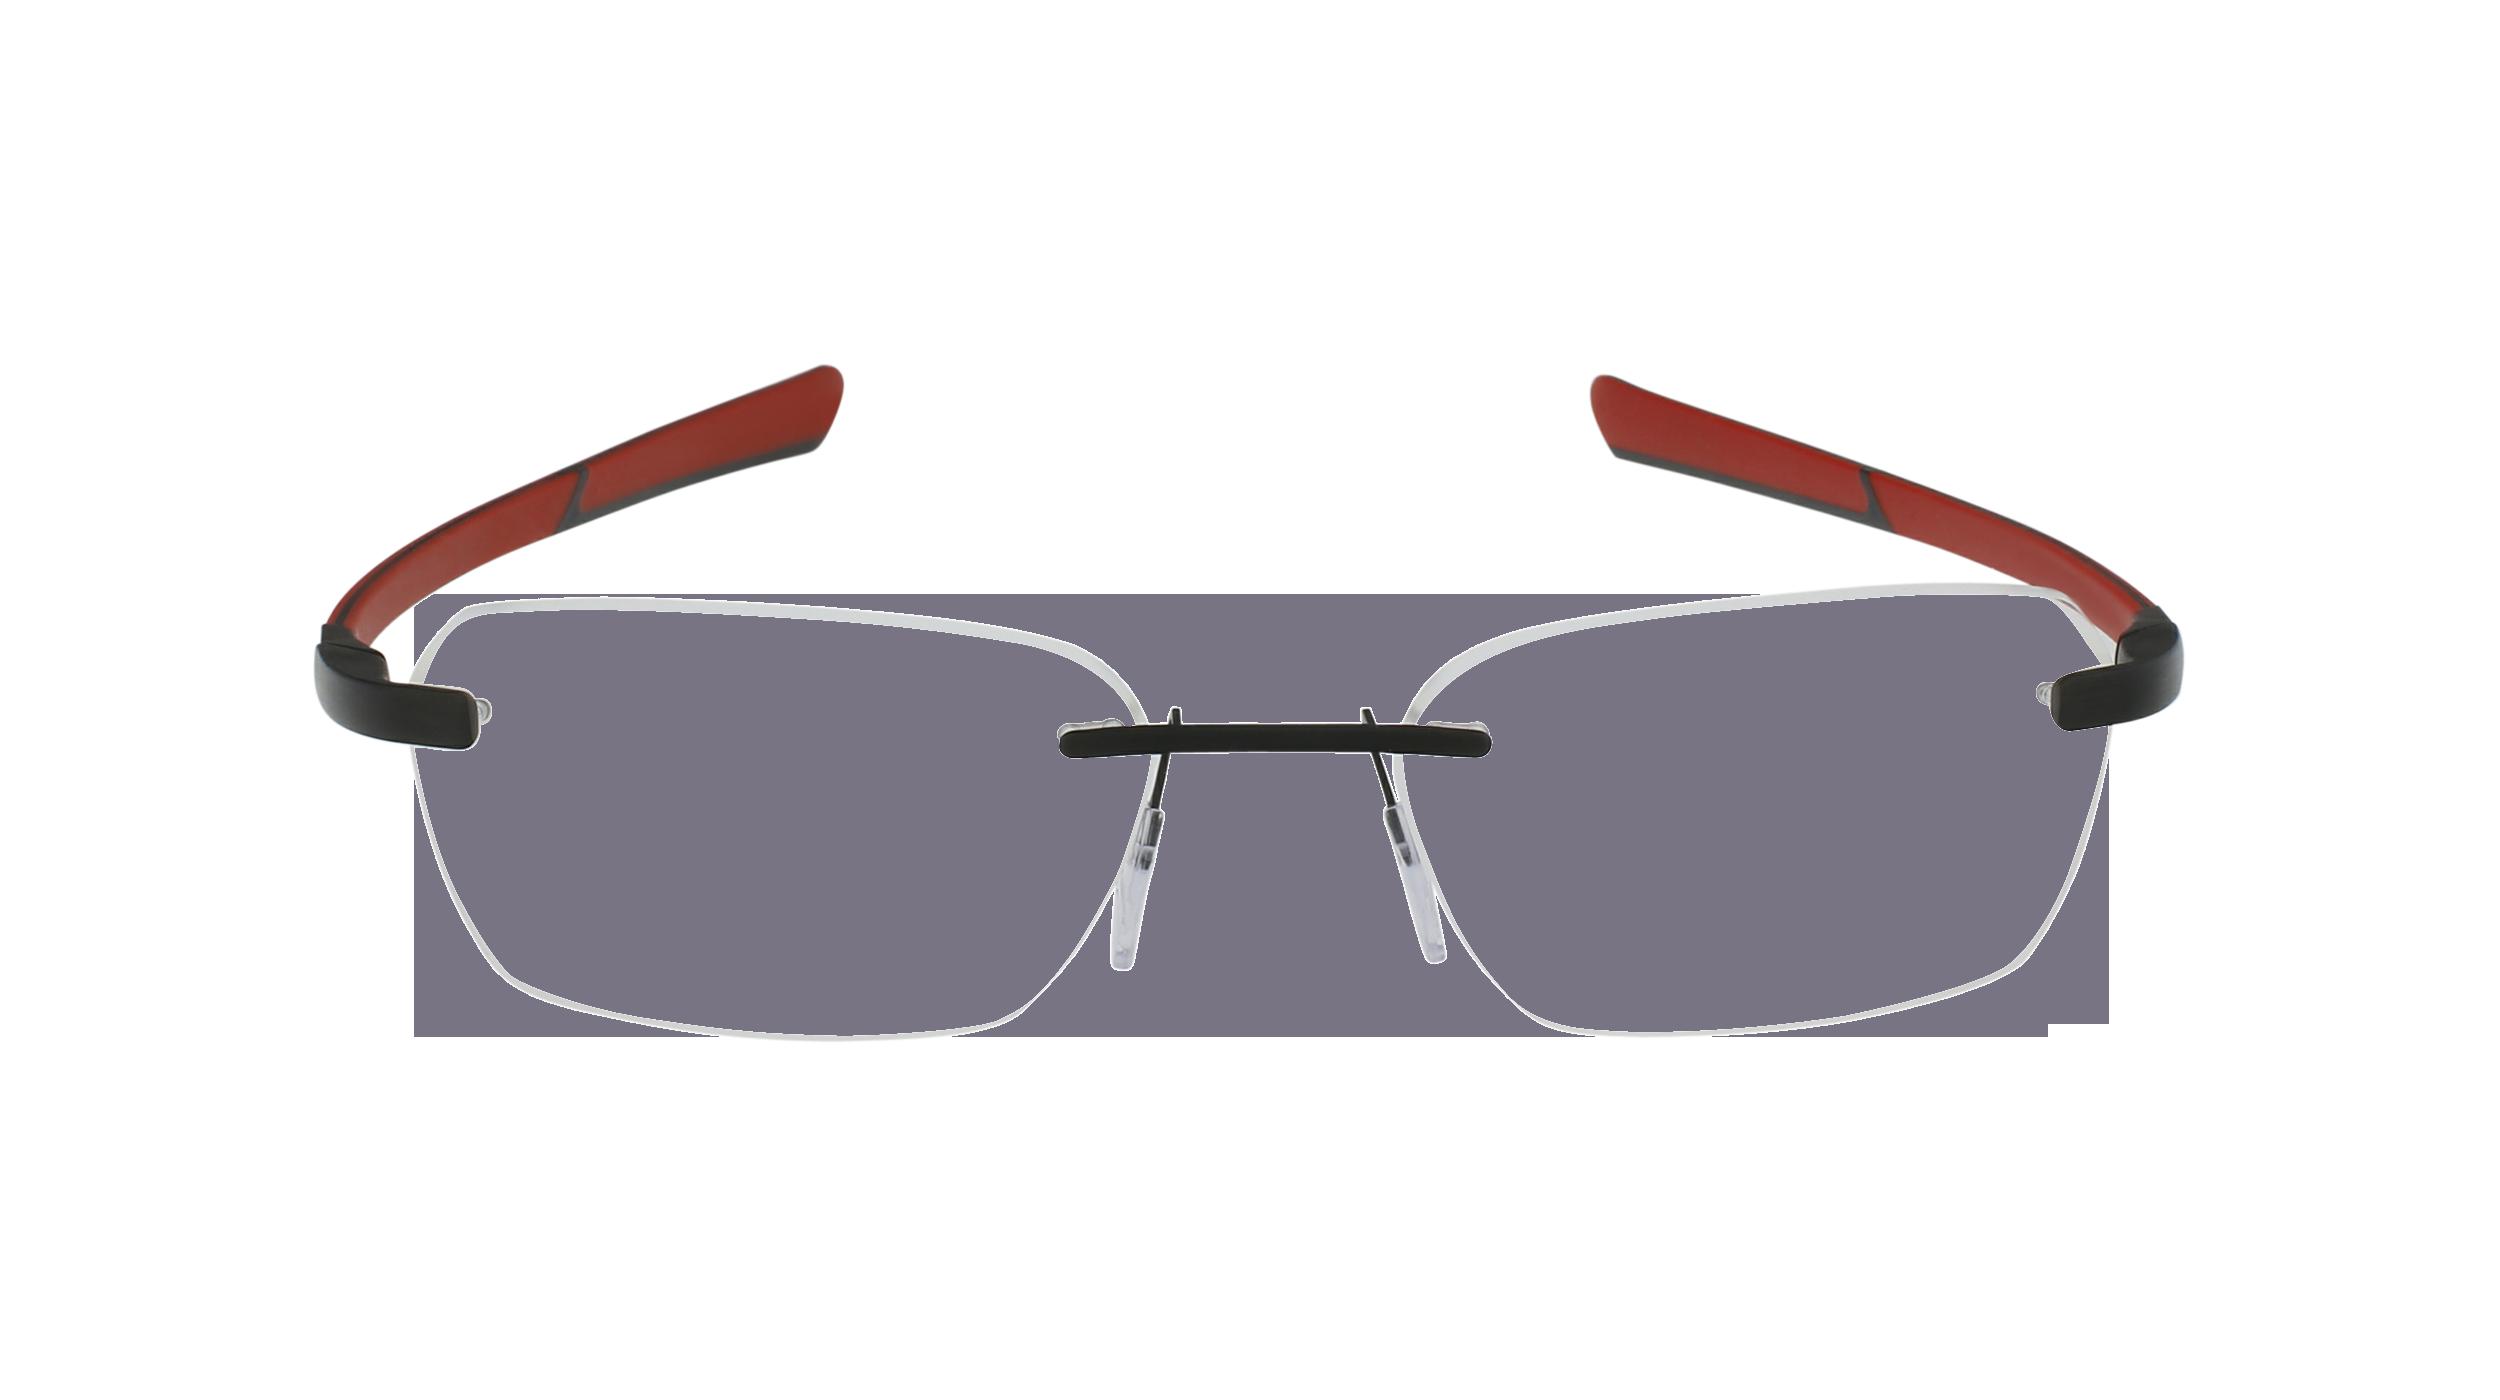 Style Name: MLSUPO22.C02.57